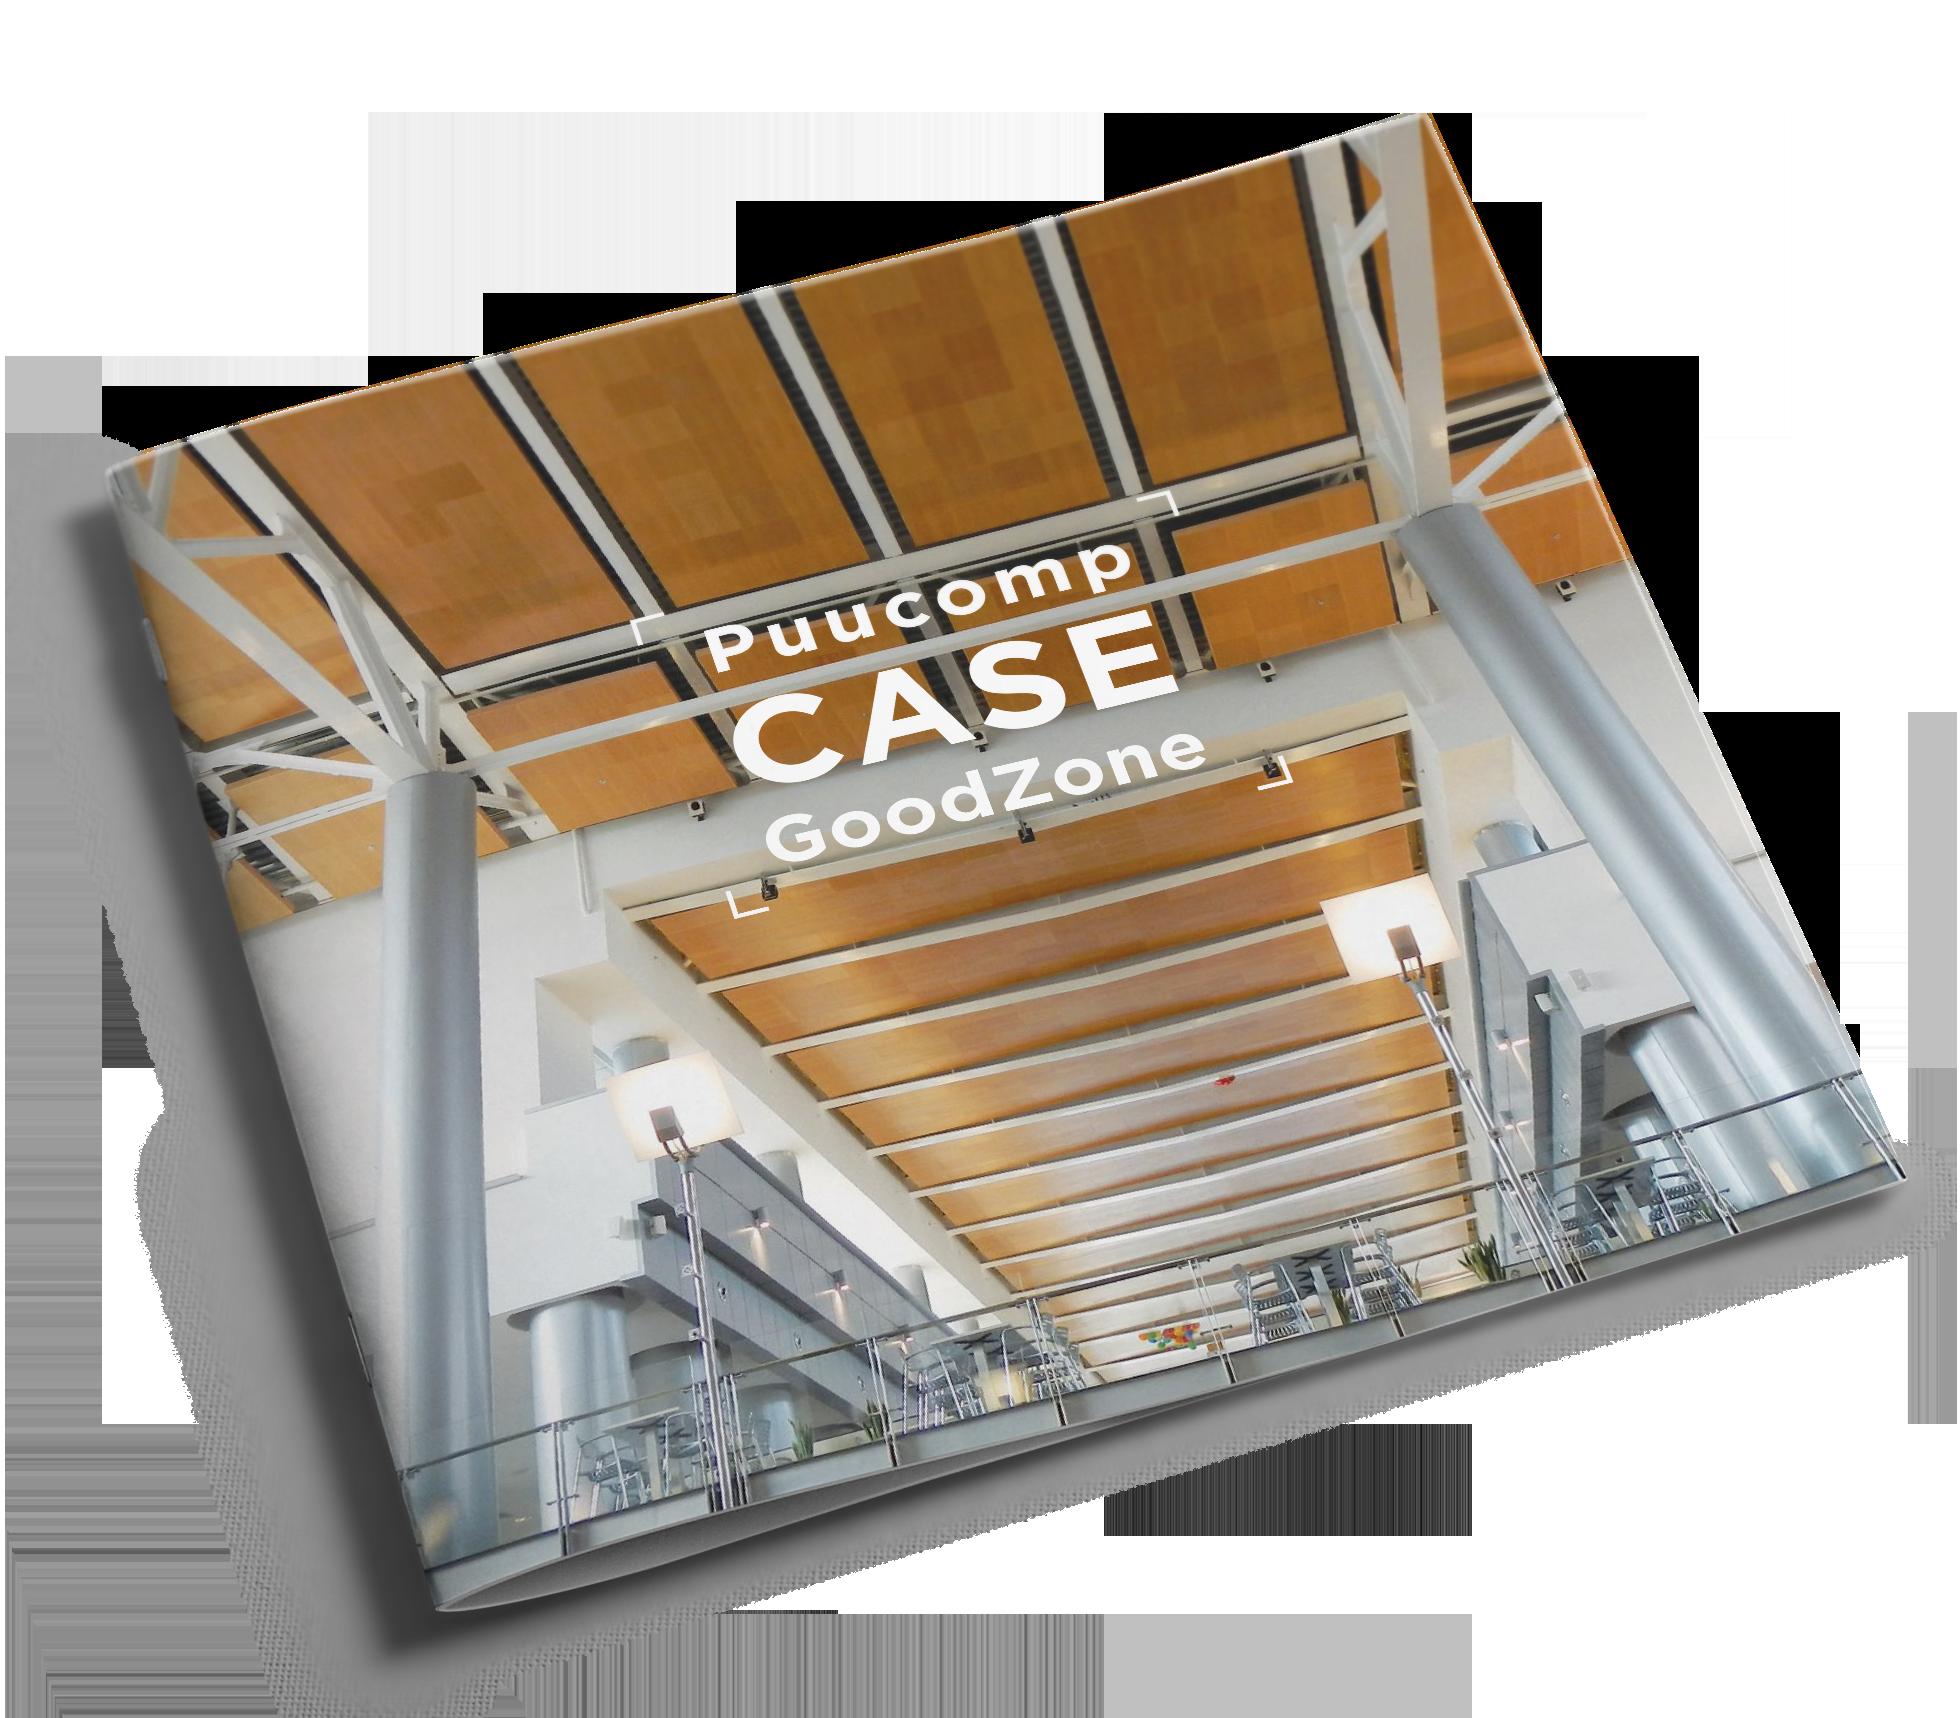 Case Goodzone